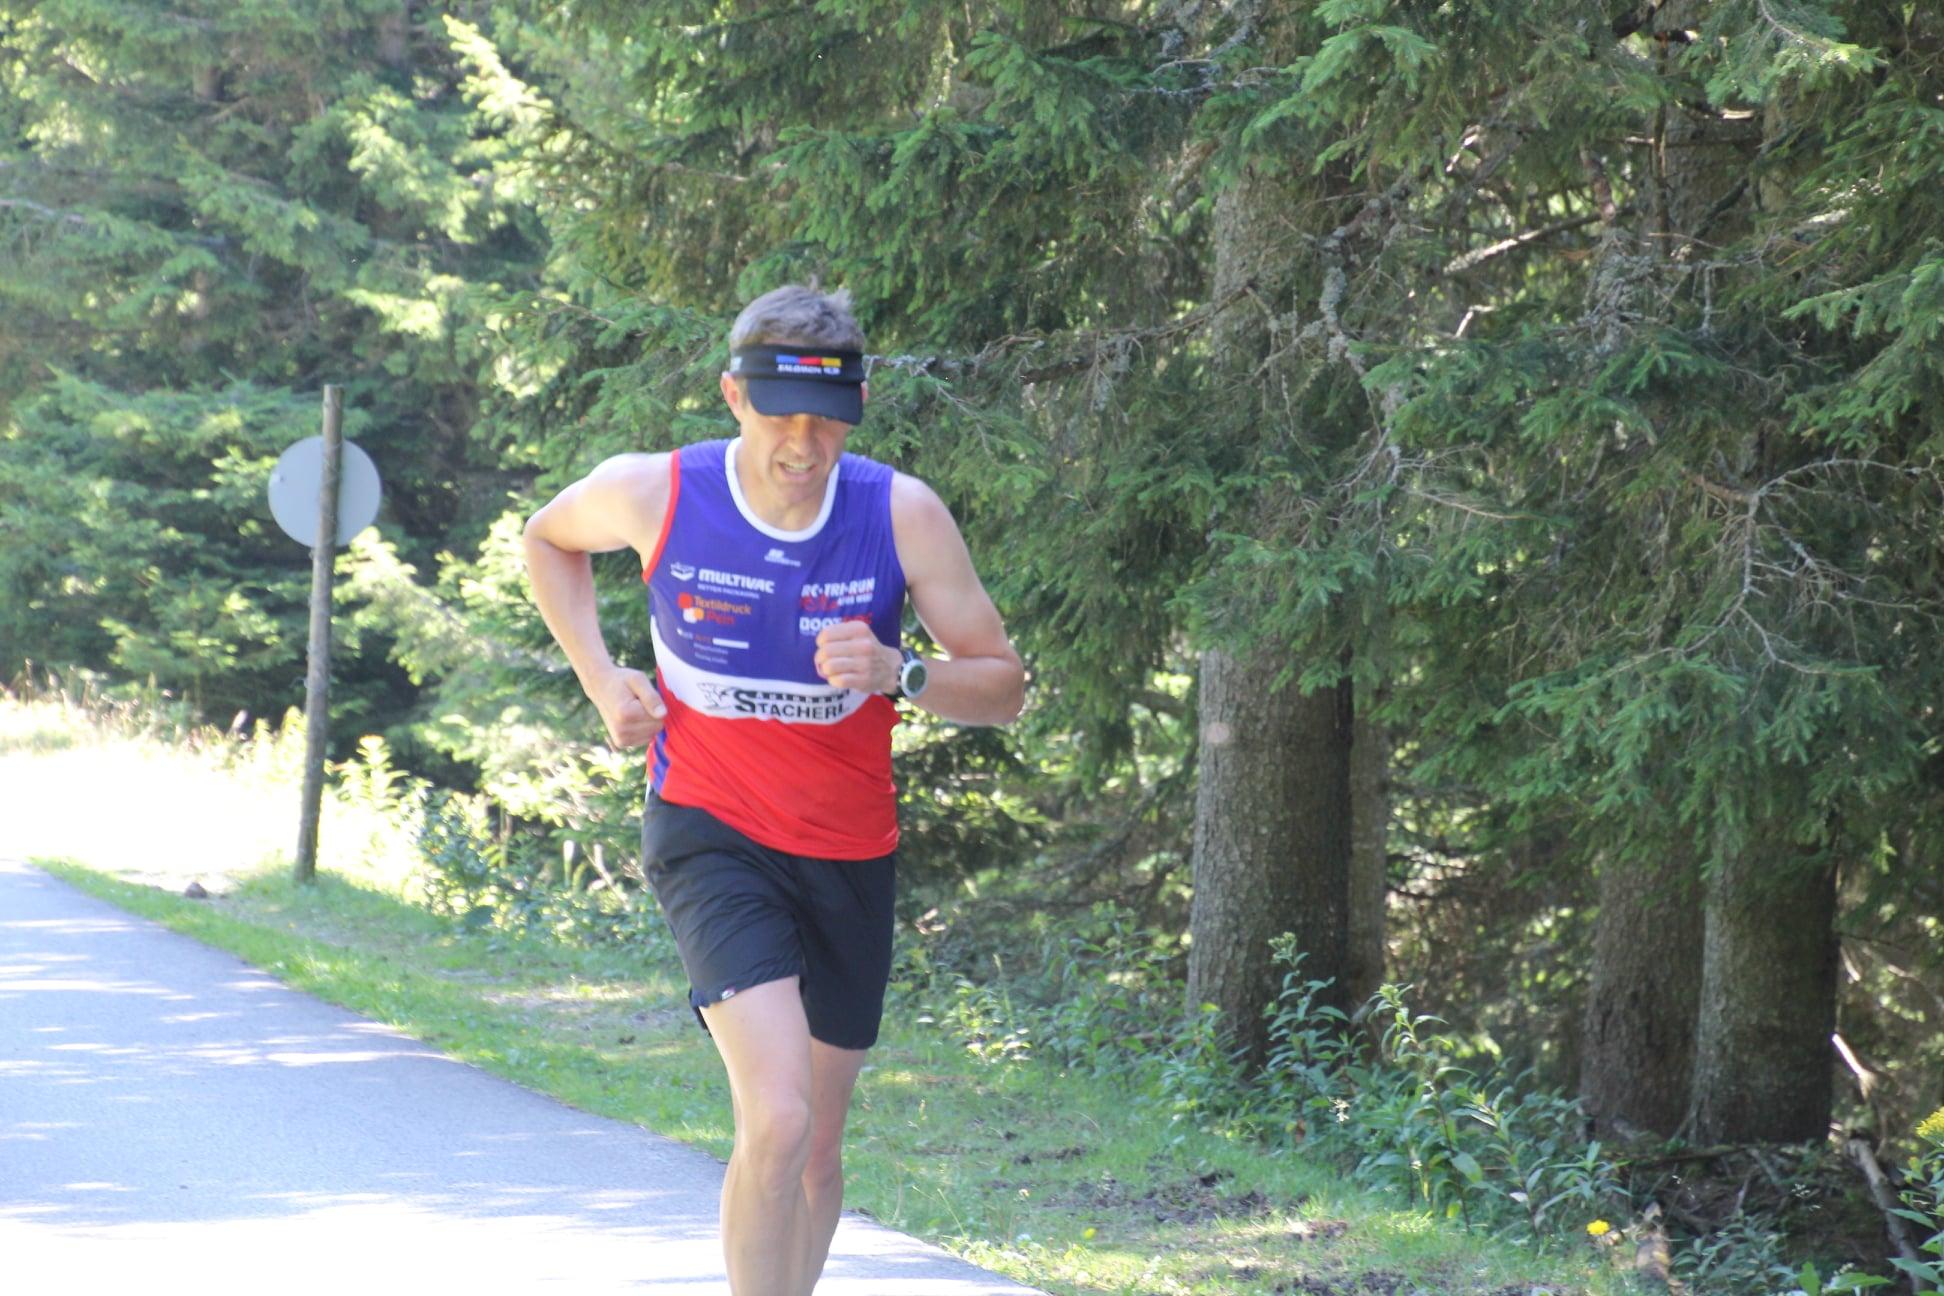 Laufen -rtr-weiz-117054862_3809009632460142_9106521467458256782_o-Schöcklplateau-Marathon 2020